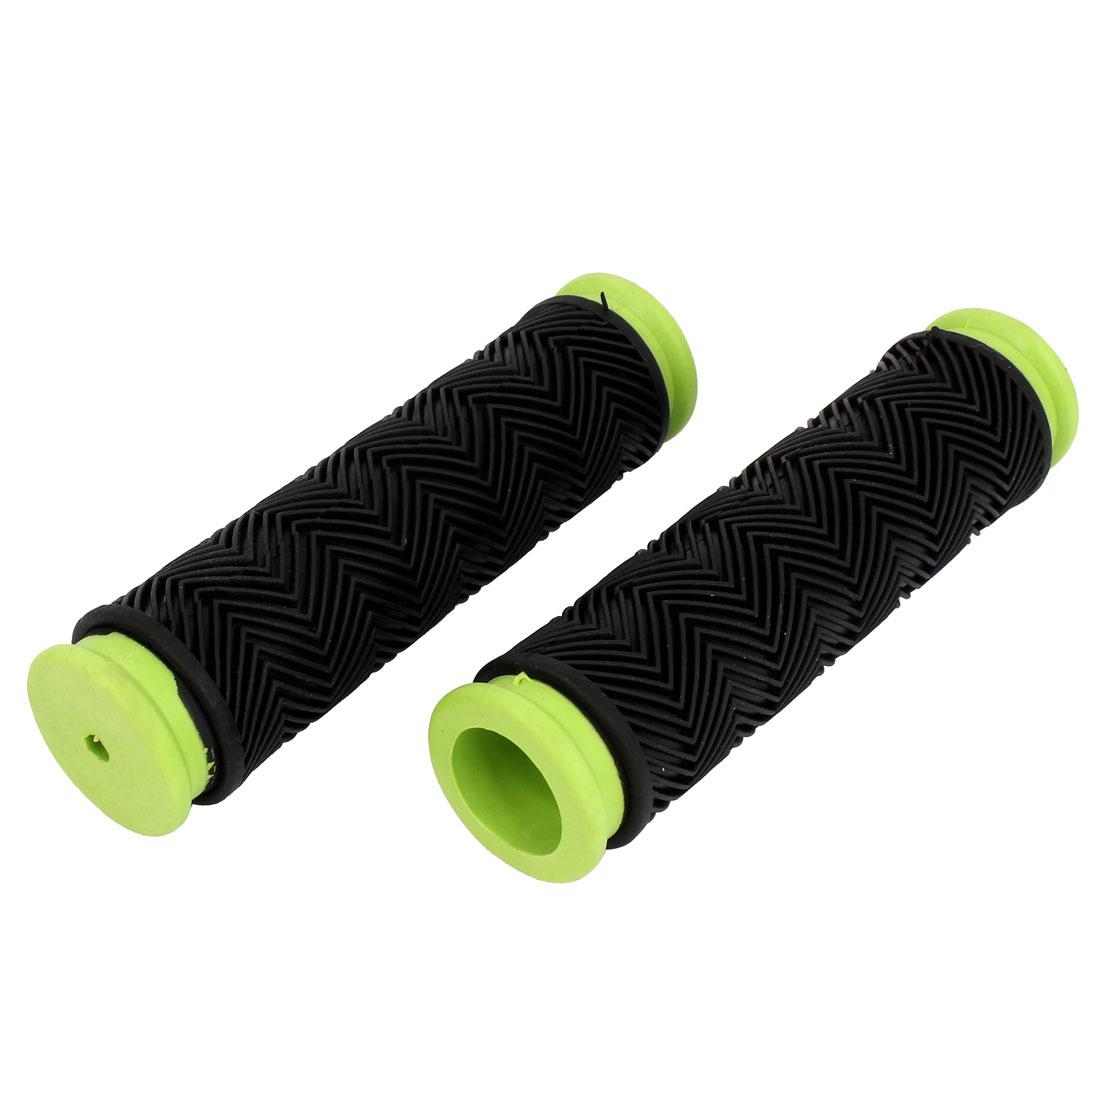 Pair Green Black Rubber Antislip Cycling Bicycle Bike Handle Bar Cover Handlebar Grip 125mm Length